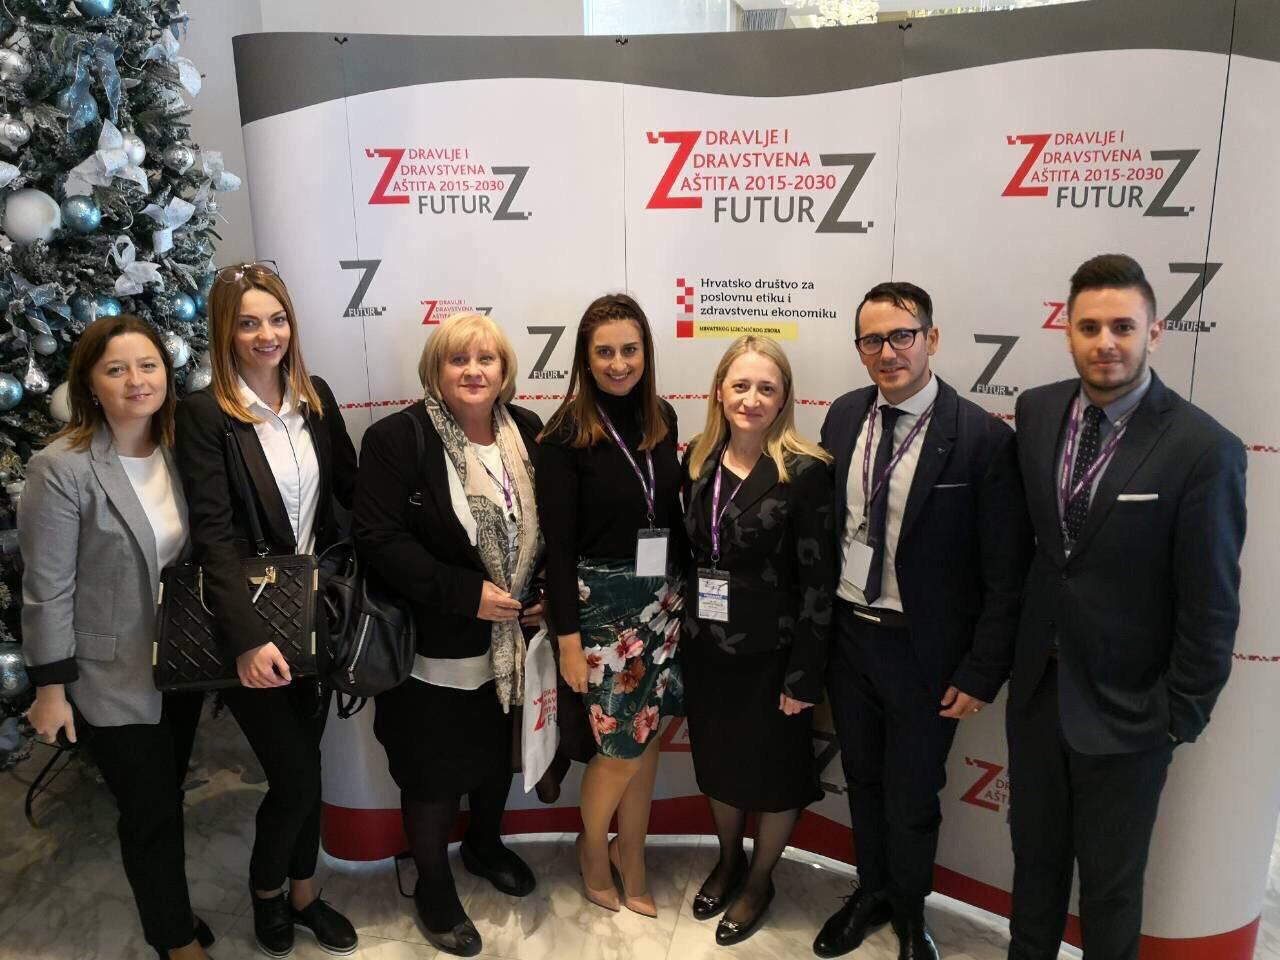 Futur-Z 2018. Martina Smrekar, Biljana Kurtović, Marija Brdarević, Anamarija Hošnjak, Snježana Čukljek, Adriano Friganović, Boris Ilić (Foto: AKZVU)